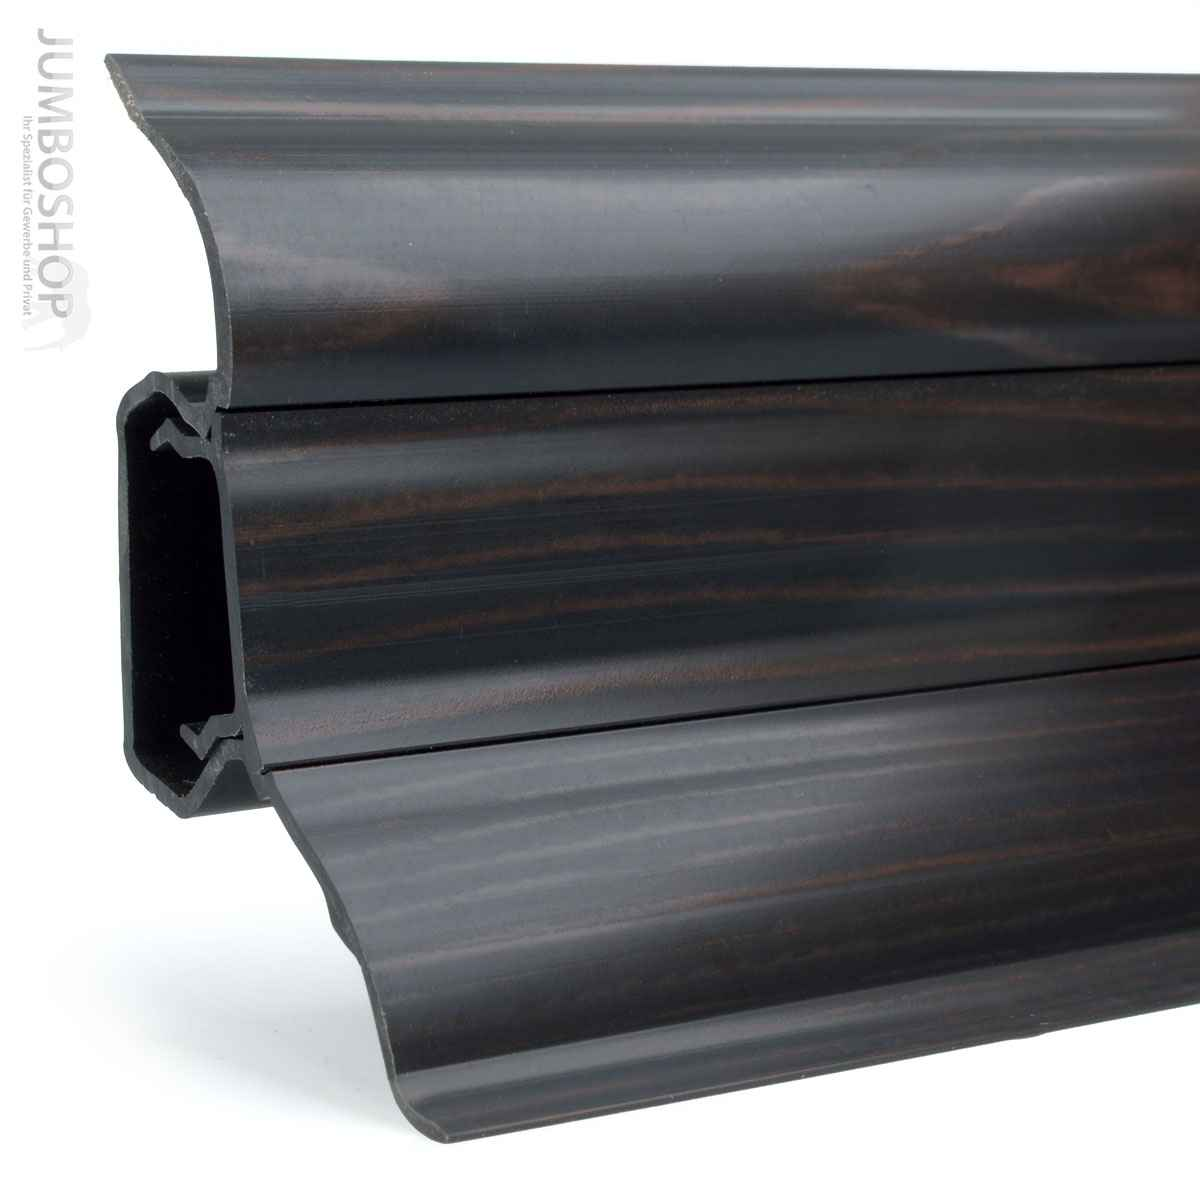 fussleisten sockelleisten pvc kunstoff laminat sockelleiste kabelkanal 52x28mm ebay. Black Bedroom Furniture Sets. Home Design Ideas